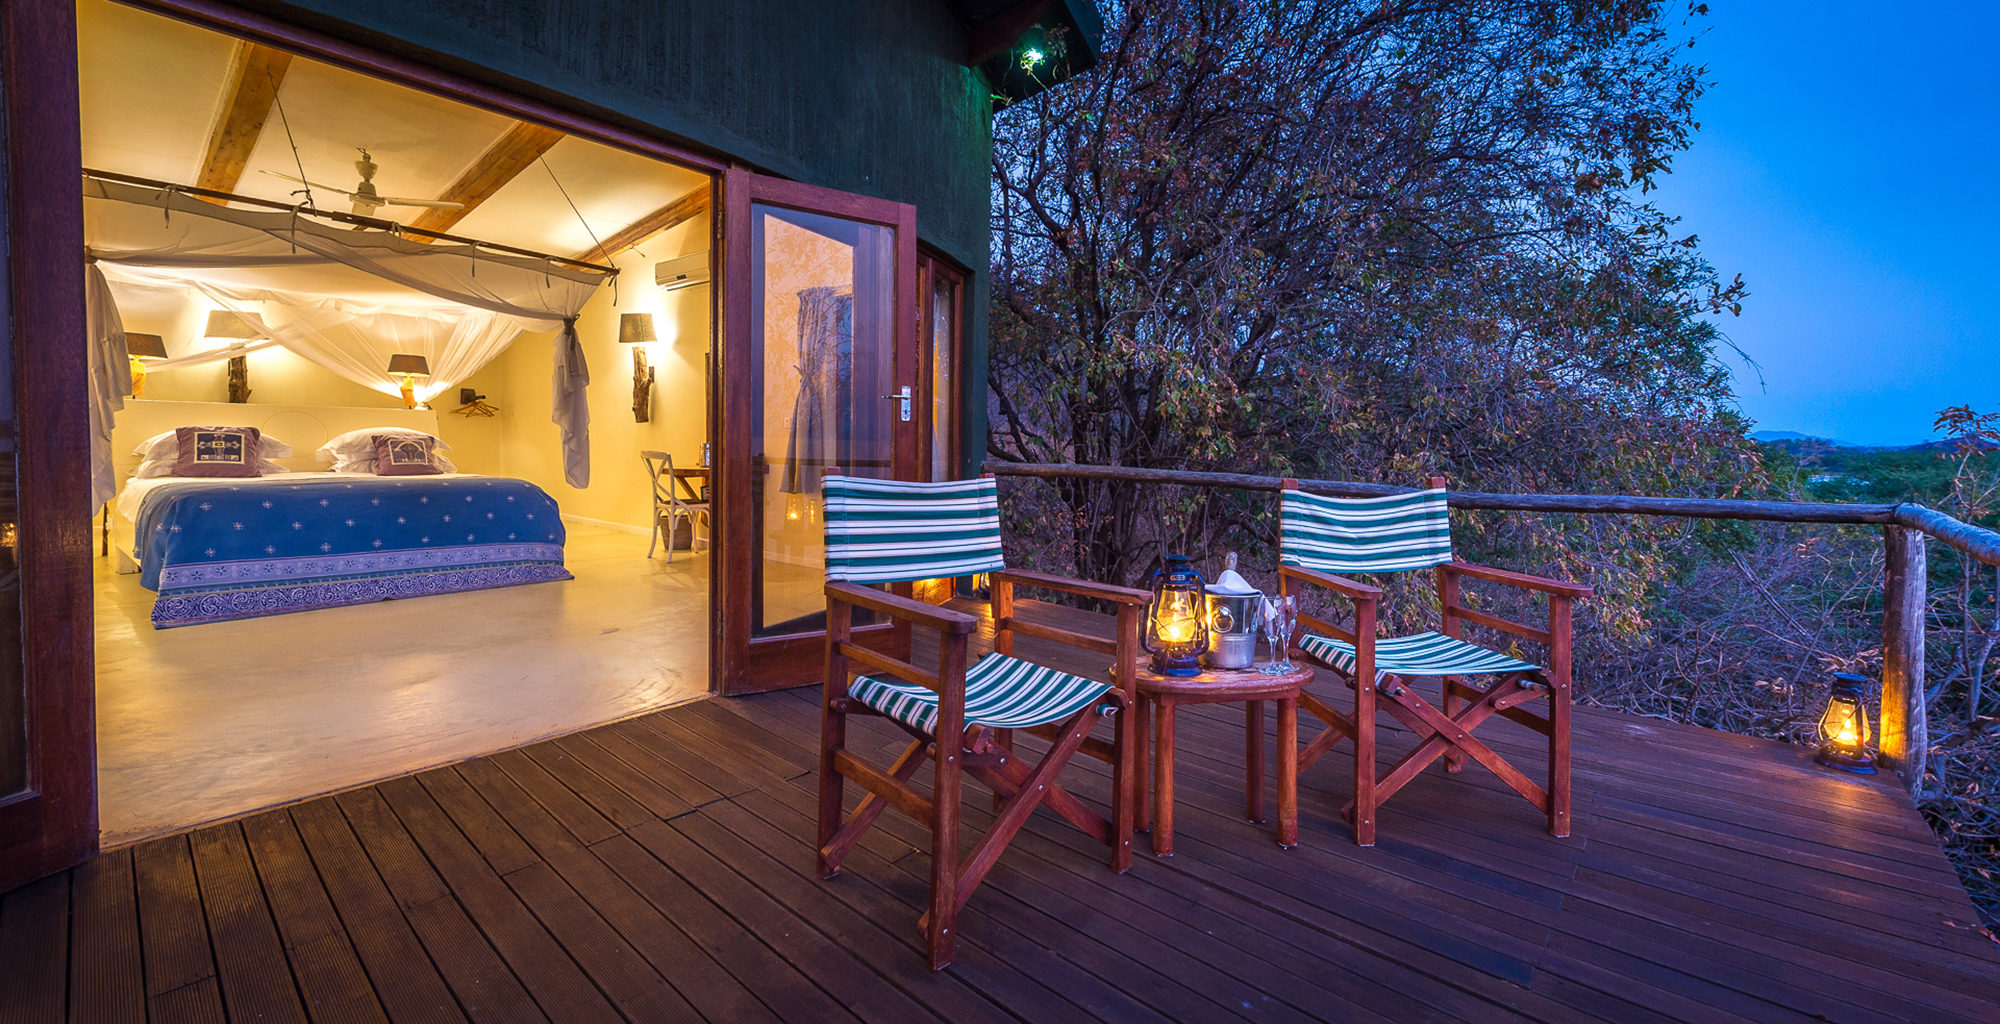 Lake-Malawi-Pumulani-Beach-Lodge-Bedroom-Exterior